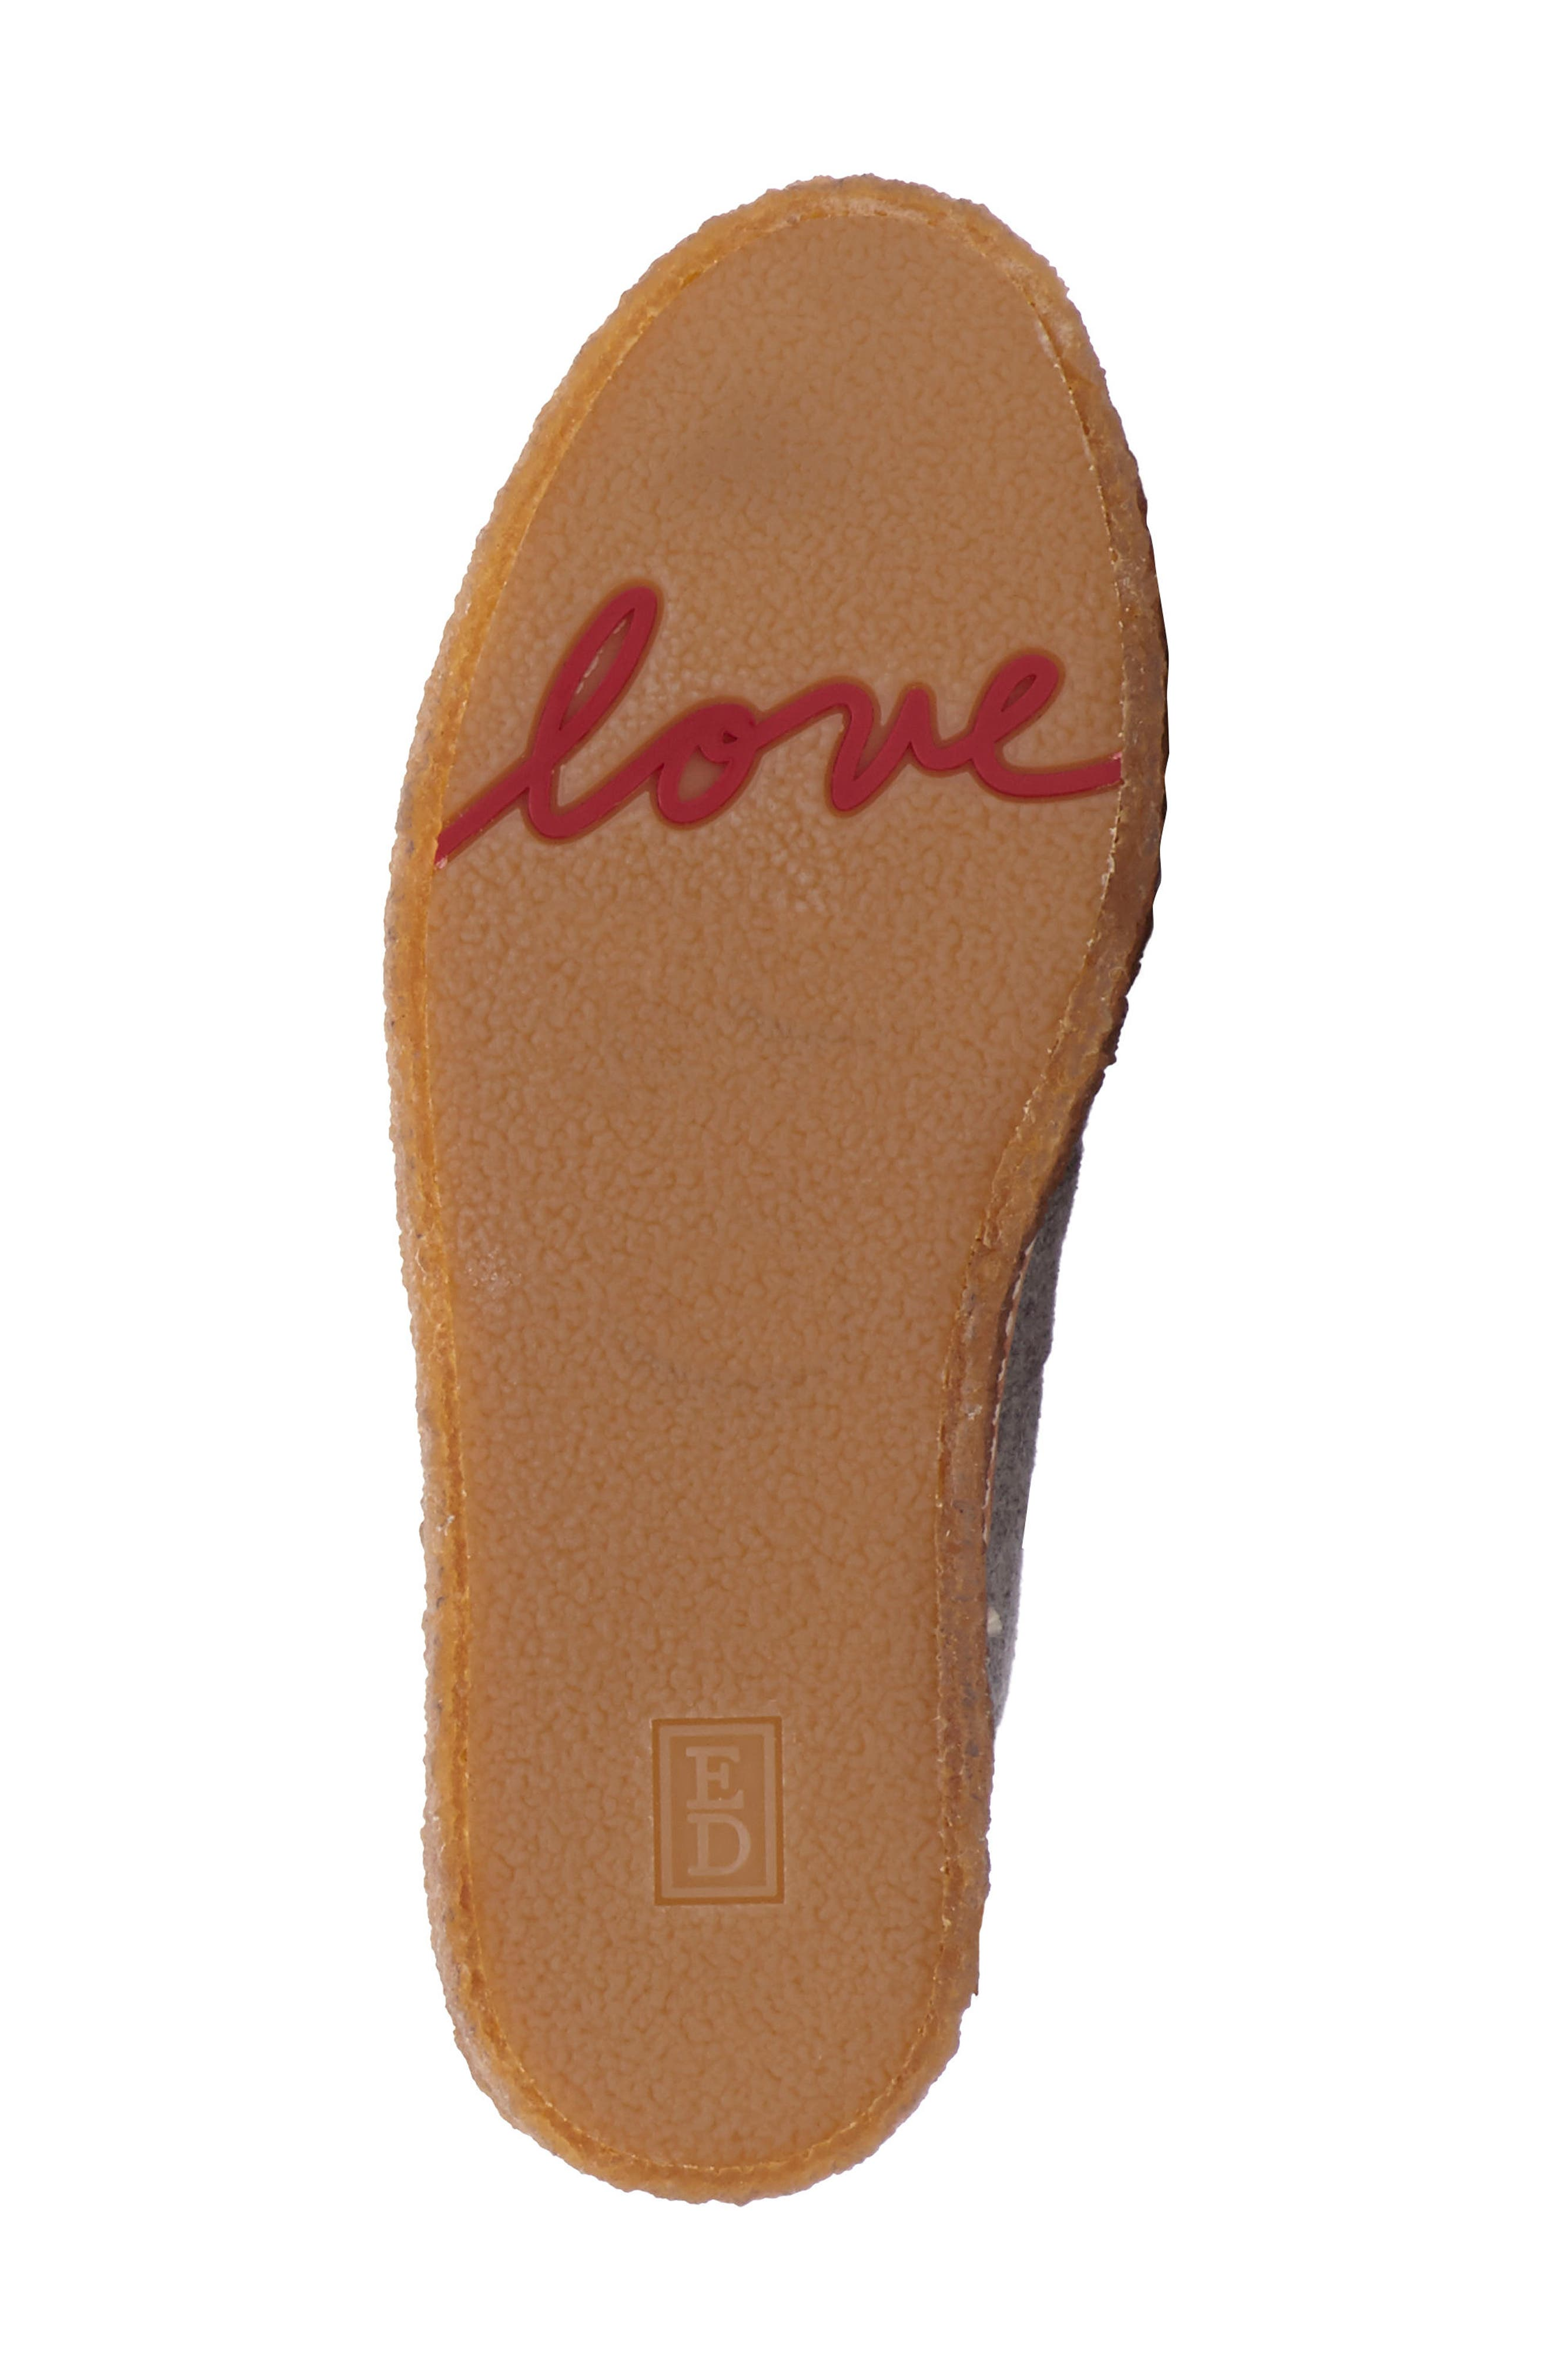 Danby Sneaker,                             Alternate thumbnail 5, color,                             022